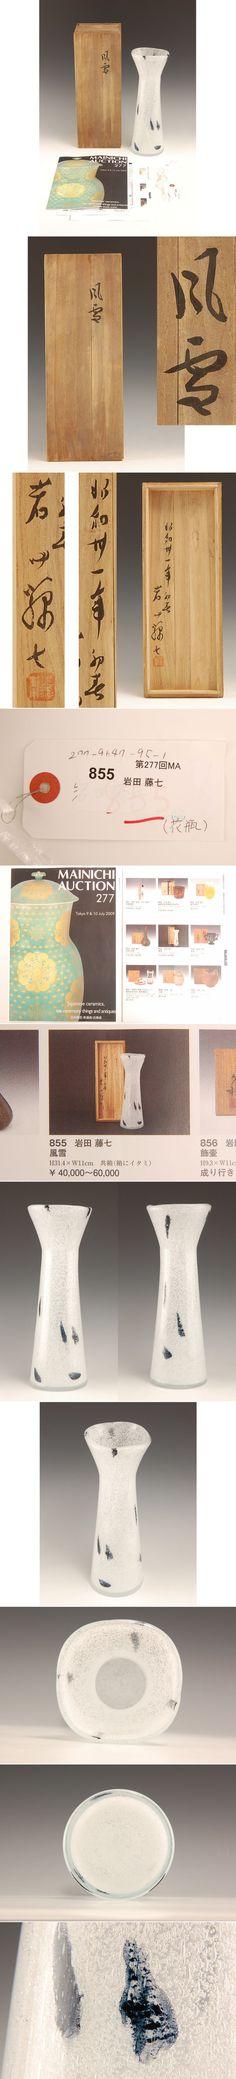 Iwata Fujinana snowstorm vase 31.5cm